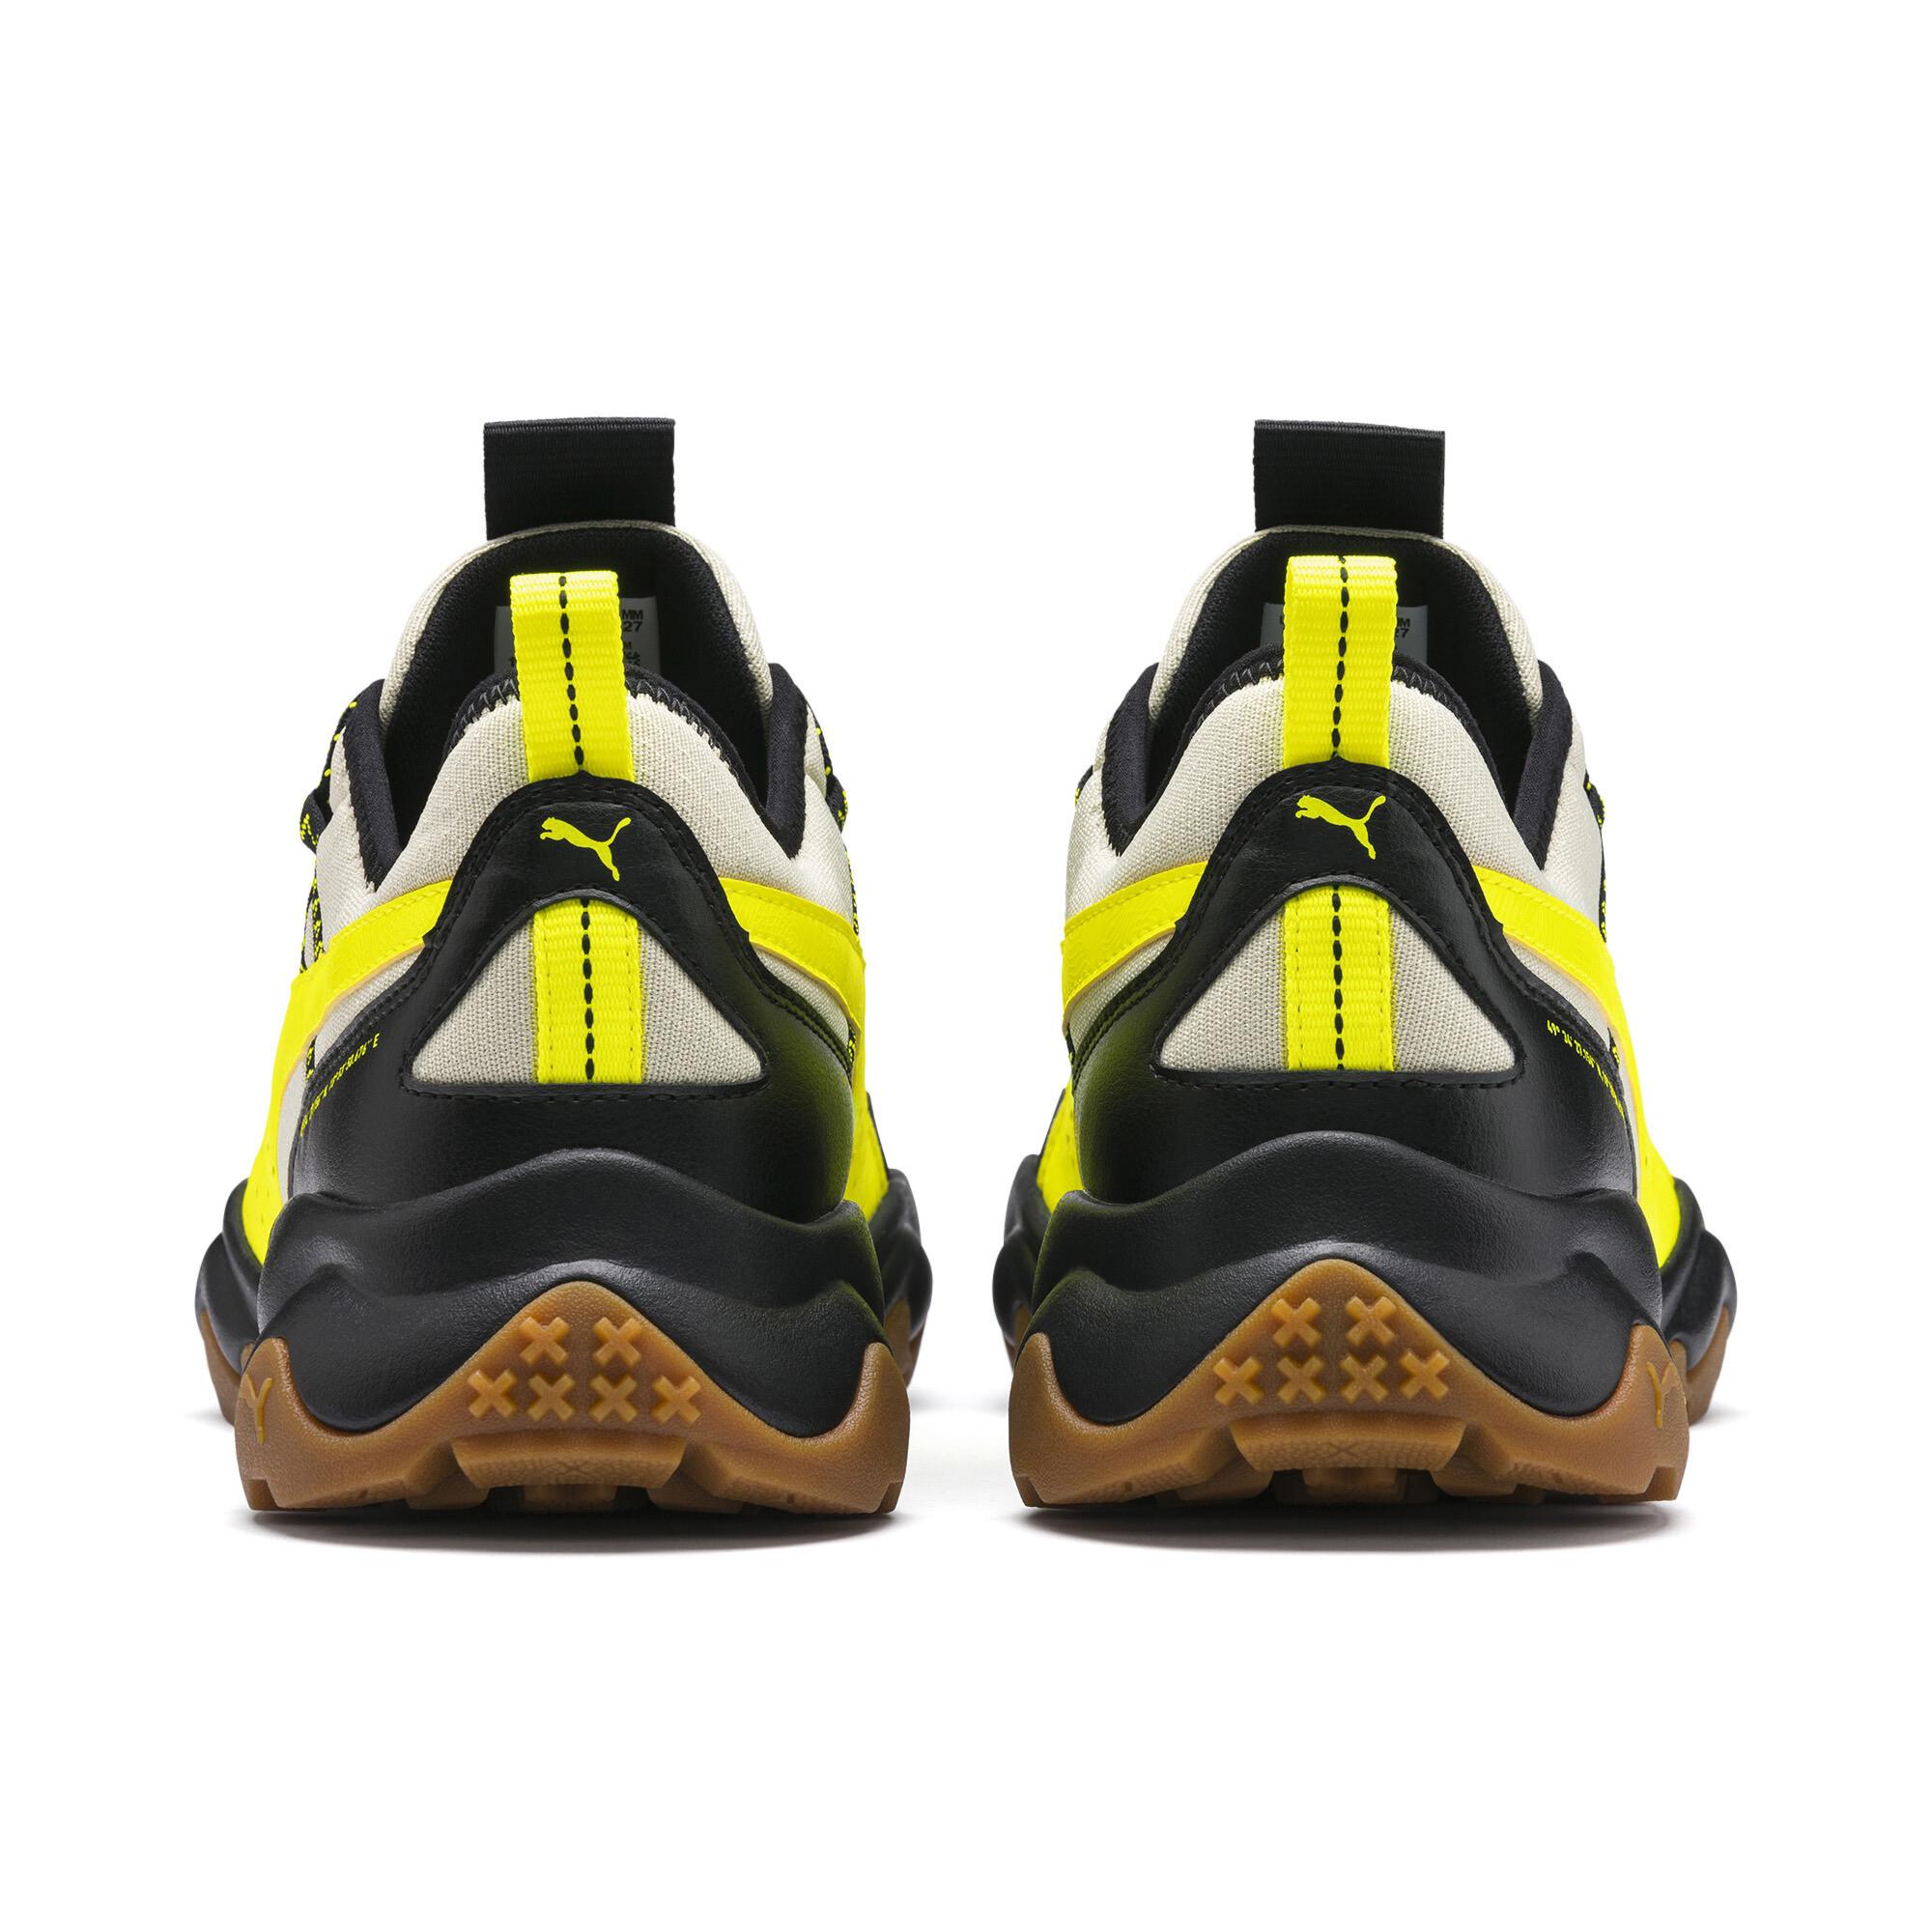 PUMA-Ember-Trail-Men-s-Running-Shoes-Men-Shoe-Running thumbnail 3